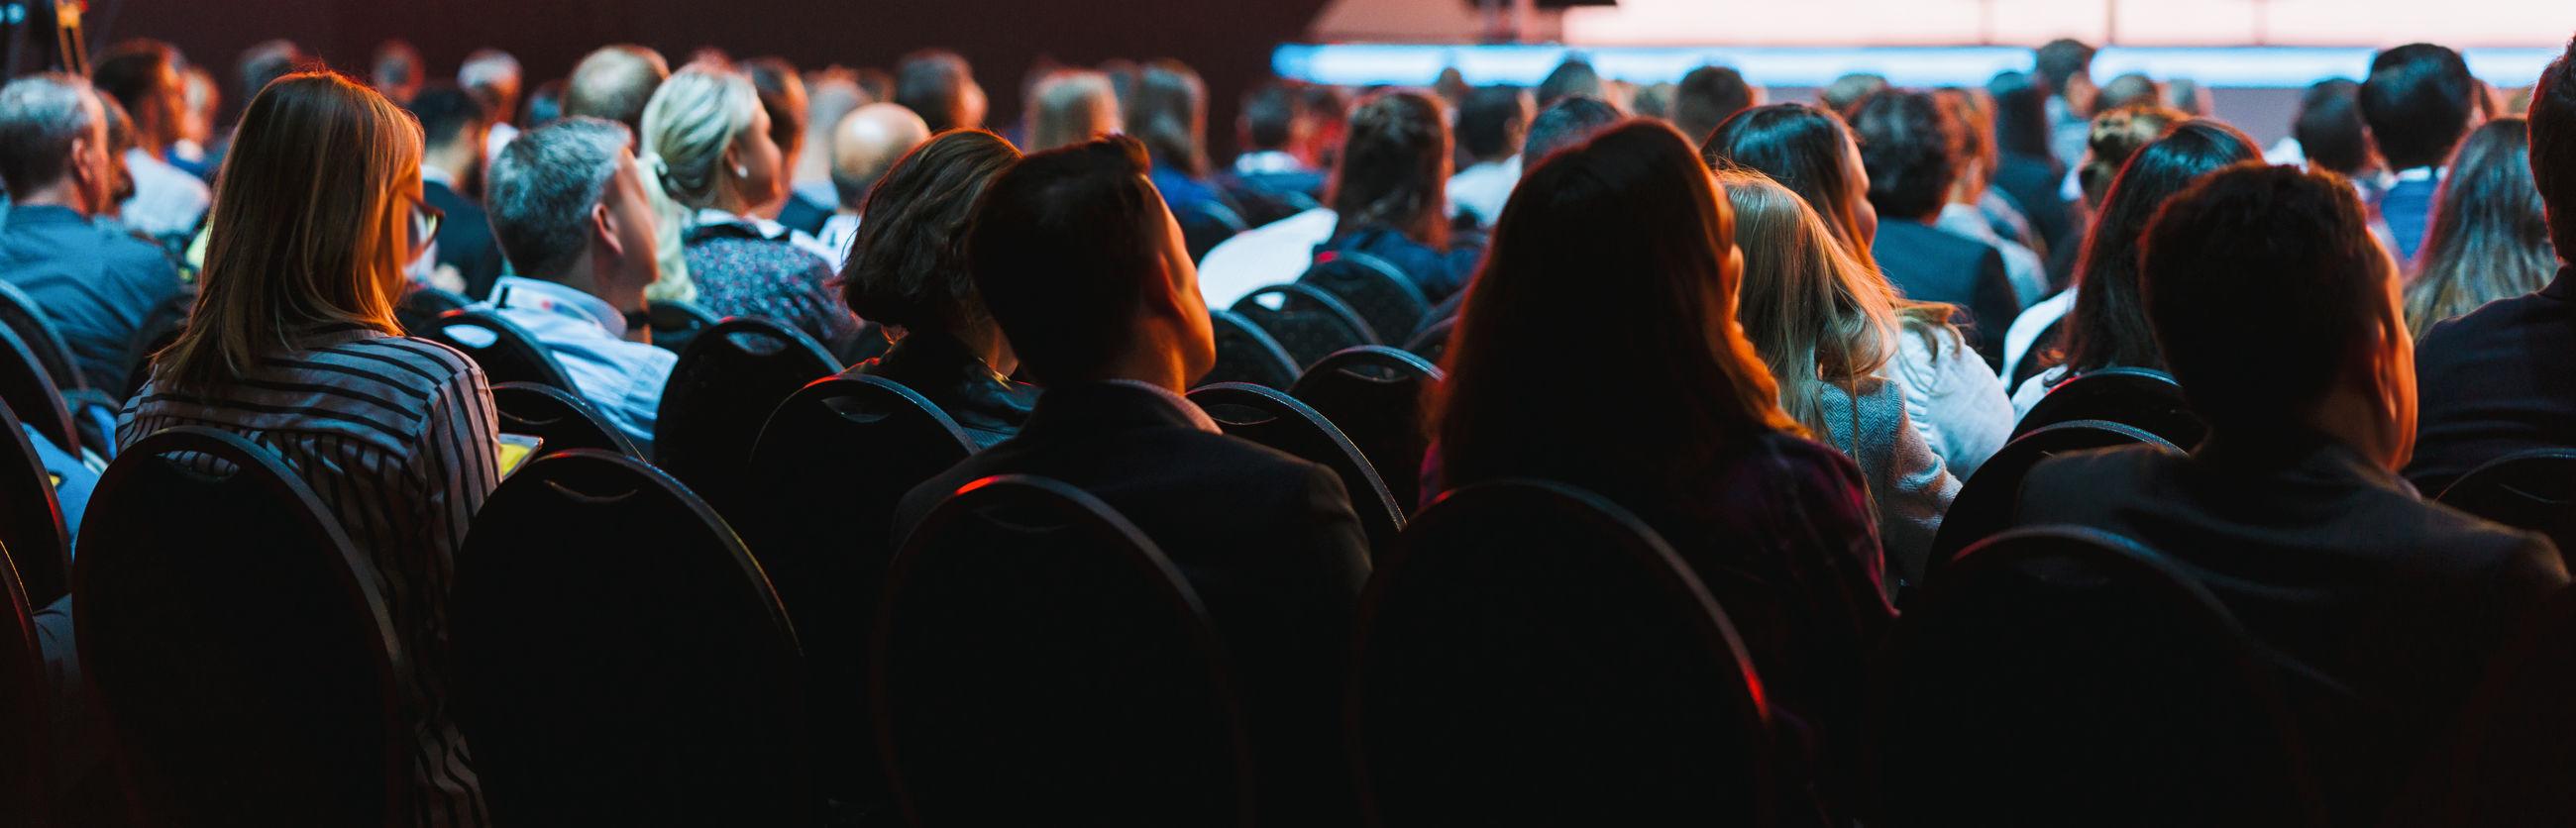 Rear view of people sitting in auditorium during seminar